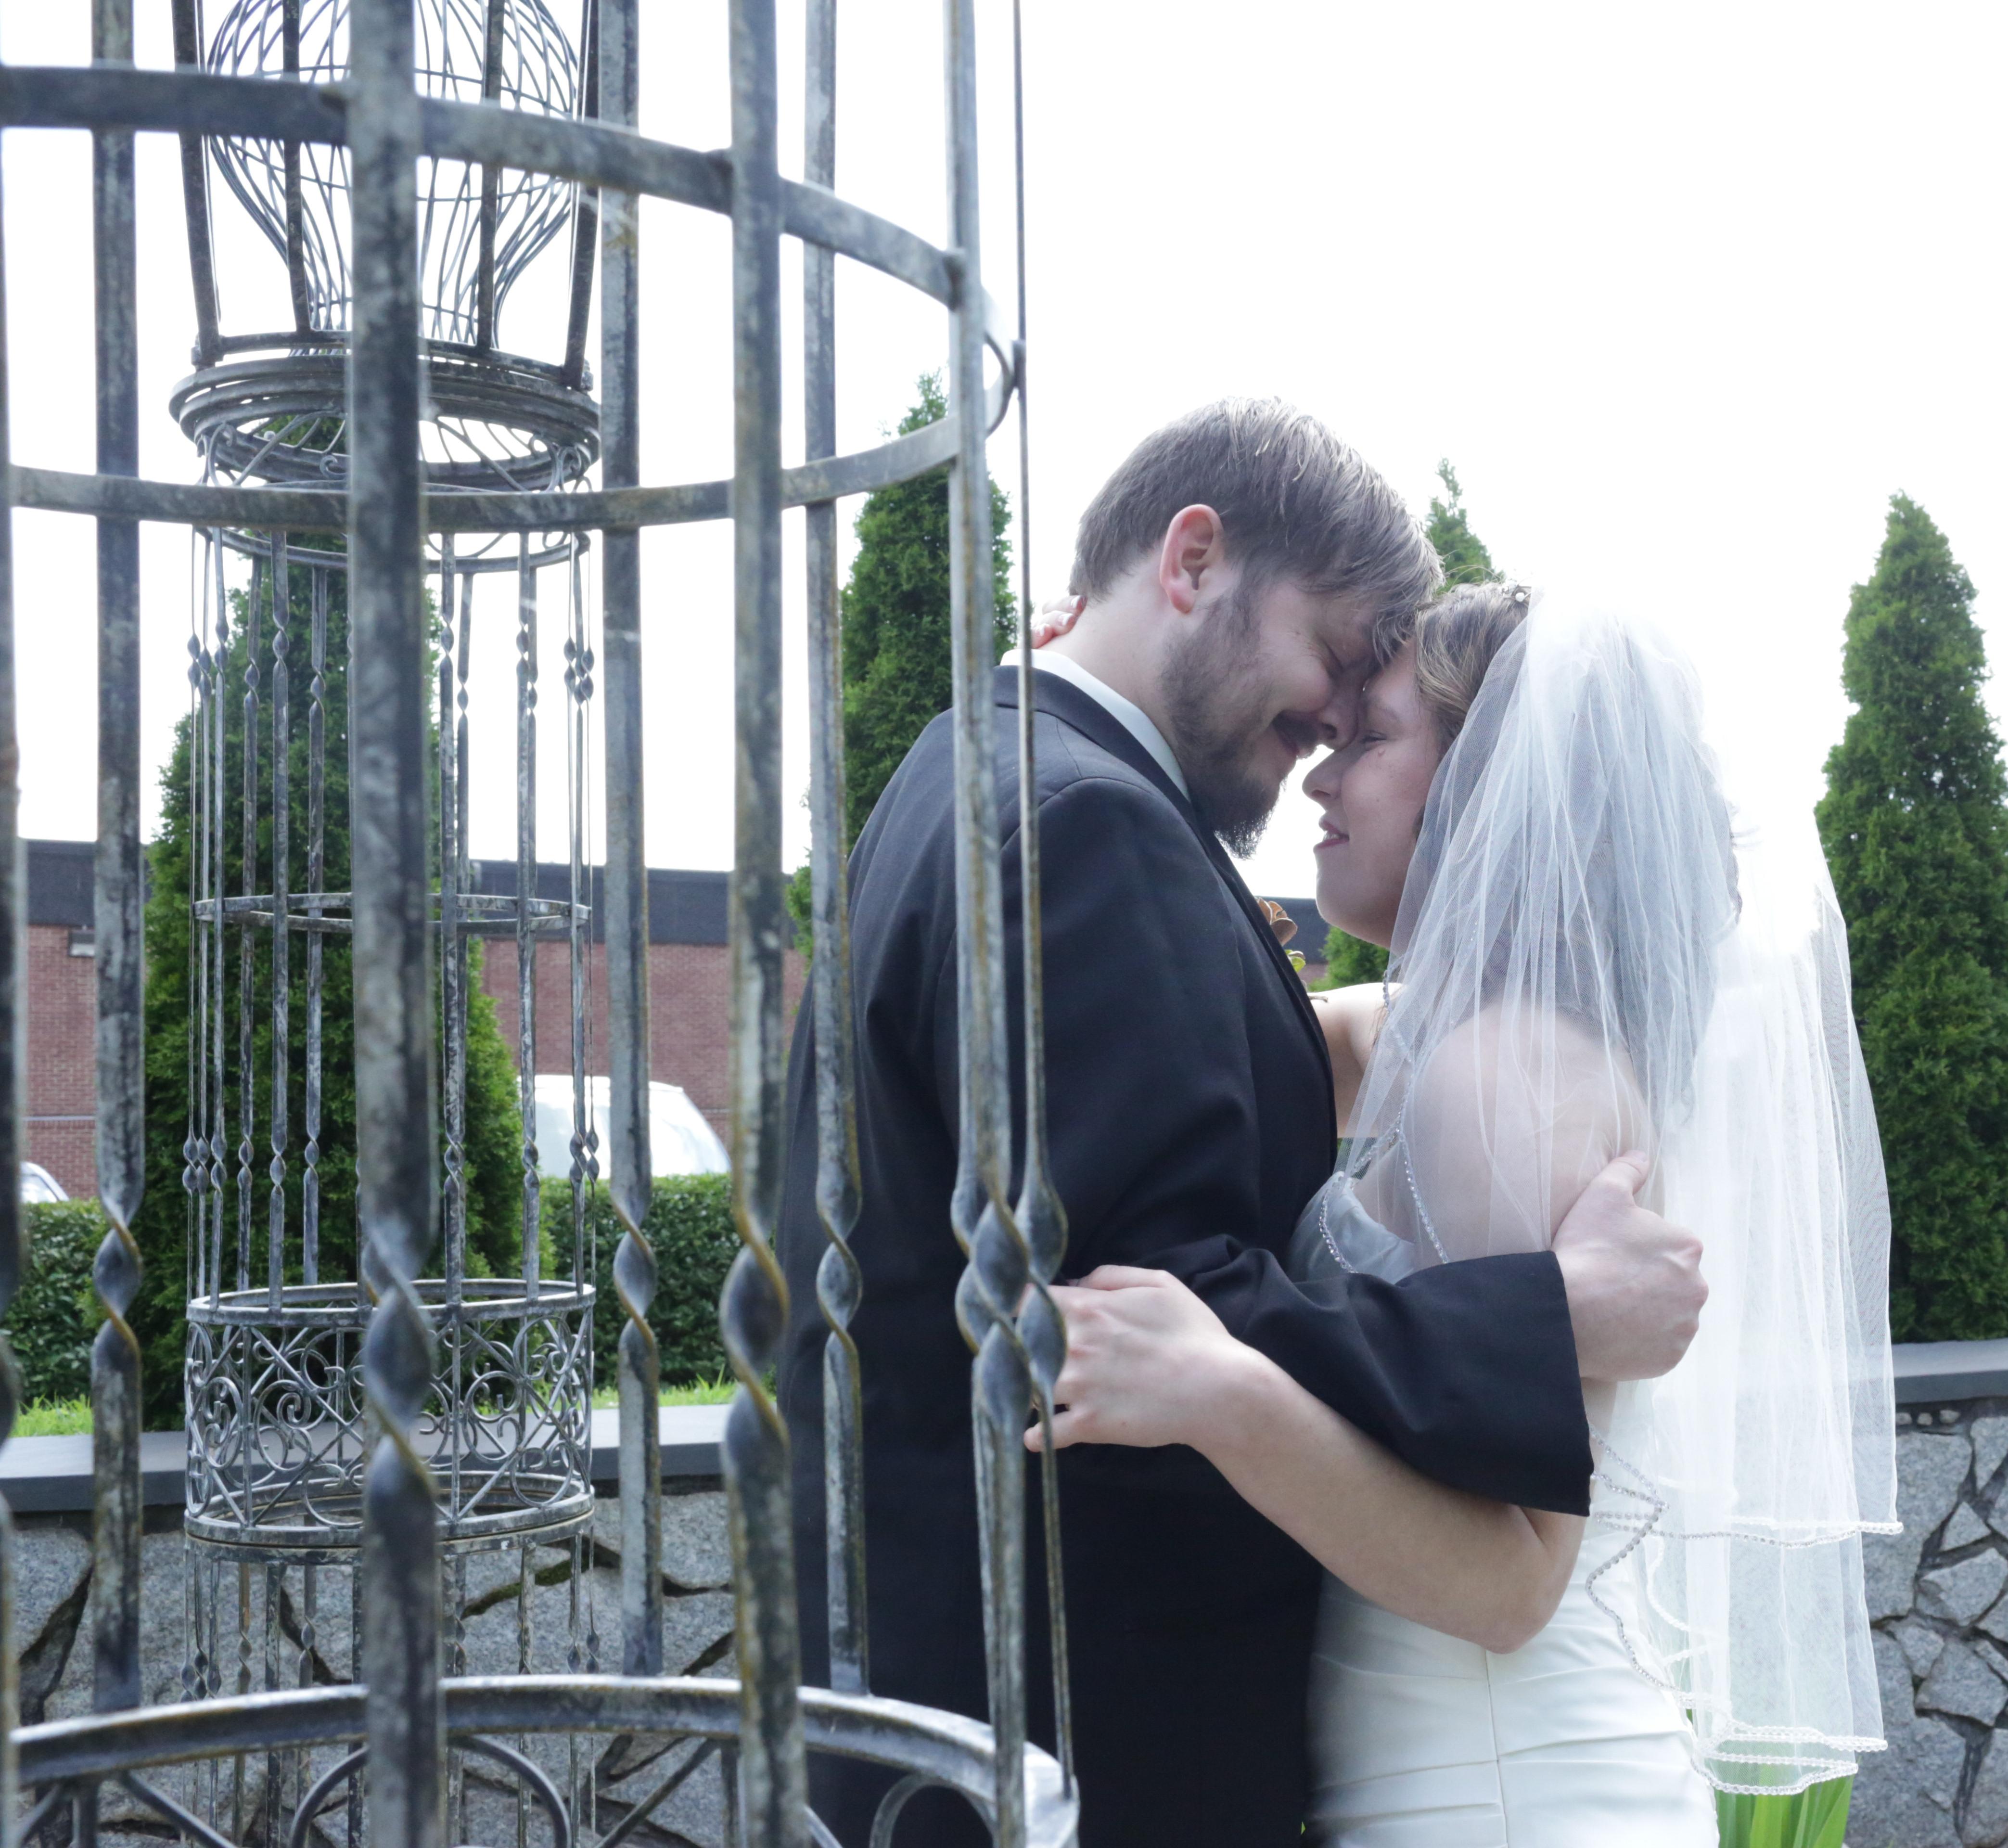 lynchburg virginia fairytale wedding country chic (1 of 1)-46